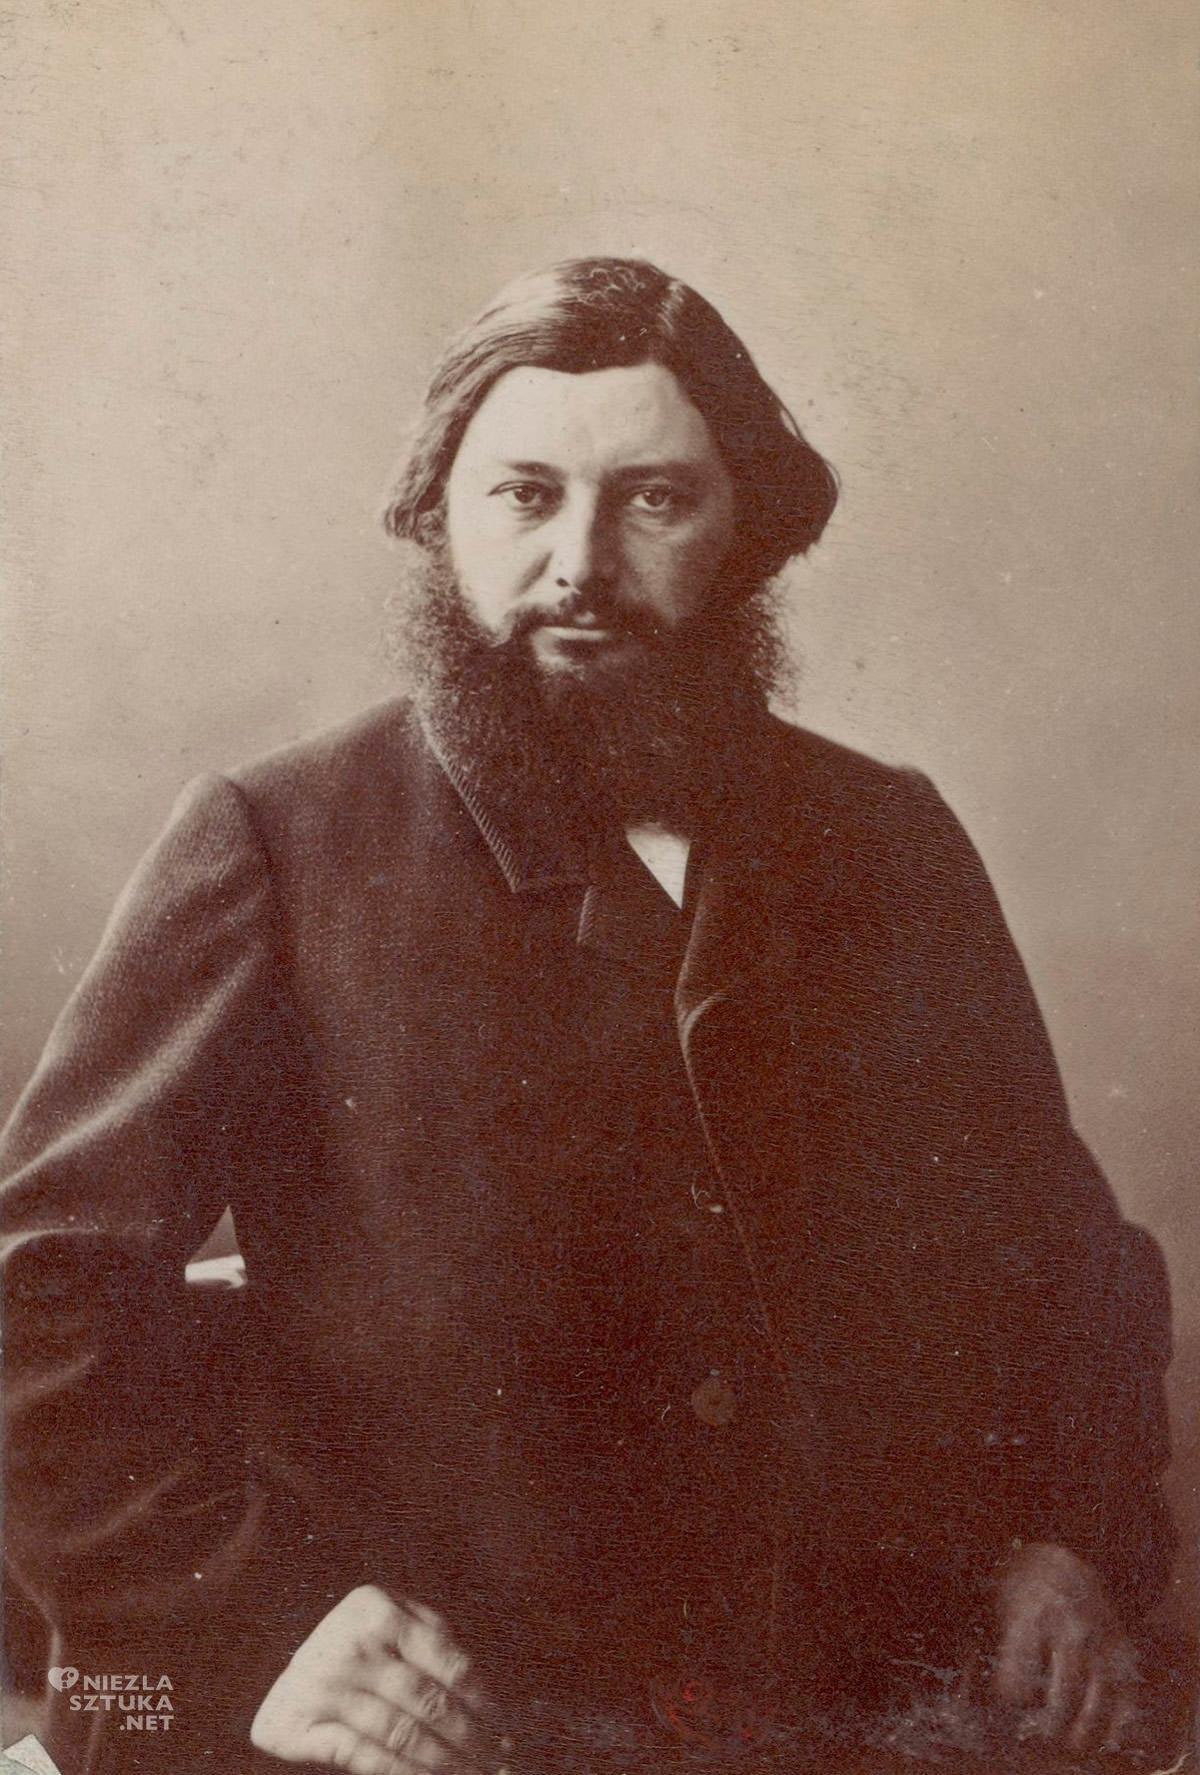 Nadar, Félix Tournachon dit, Portret Gustawa Courbeta, portret, fotografia, Niezła Sztuka